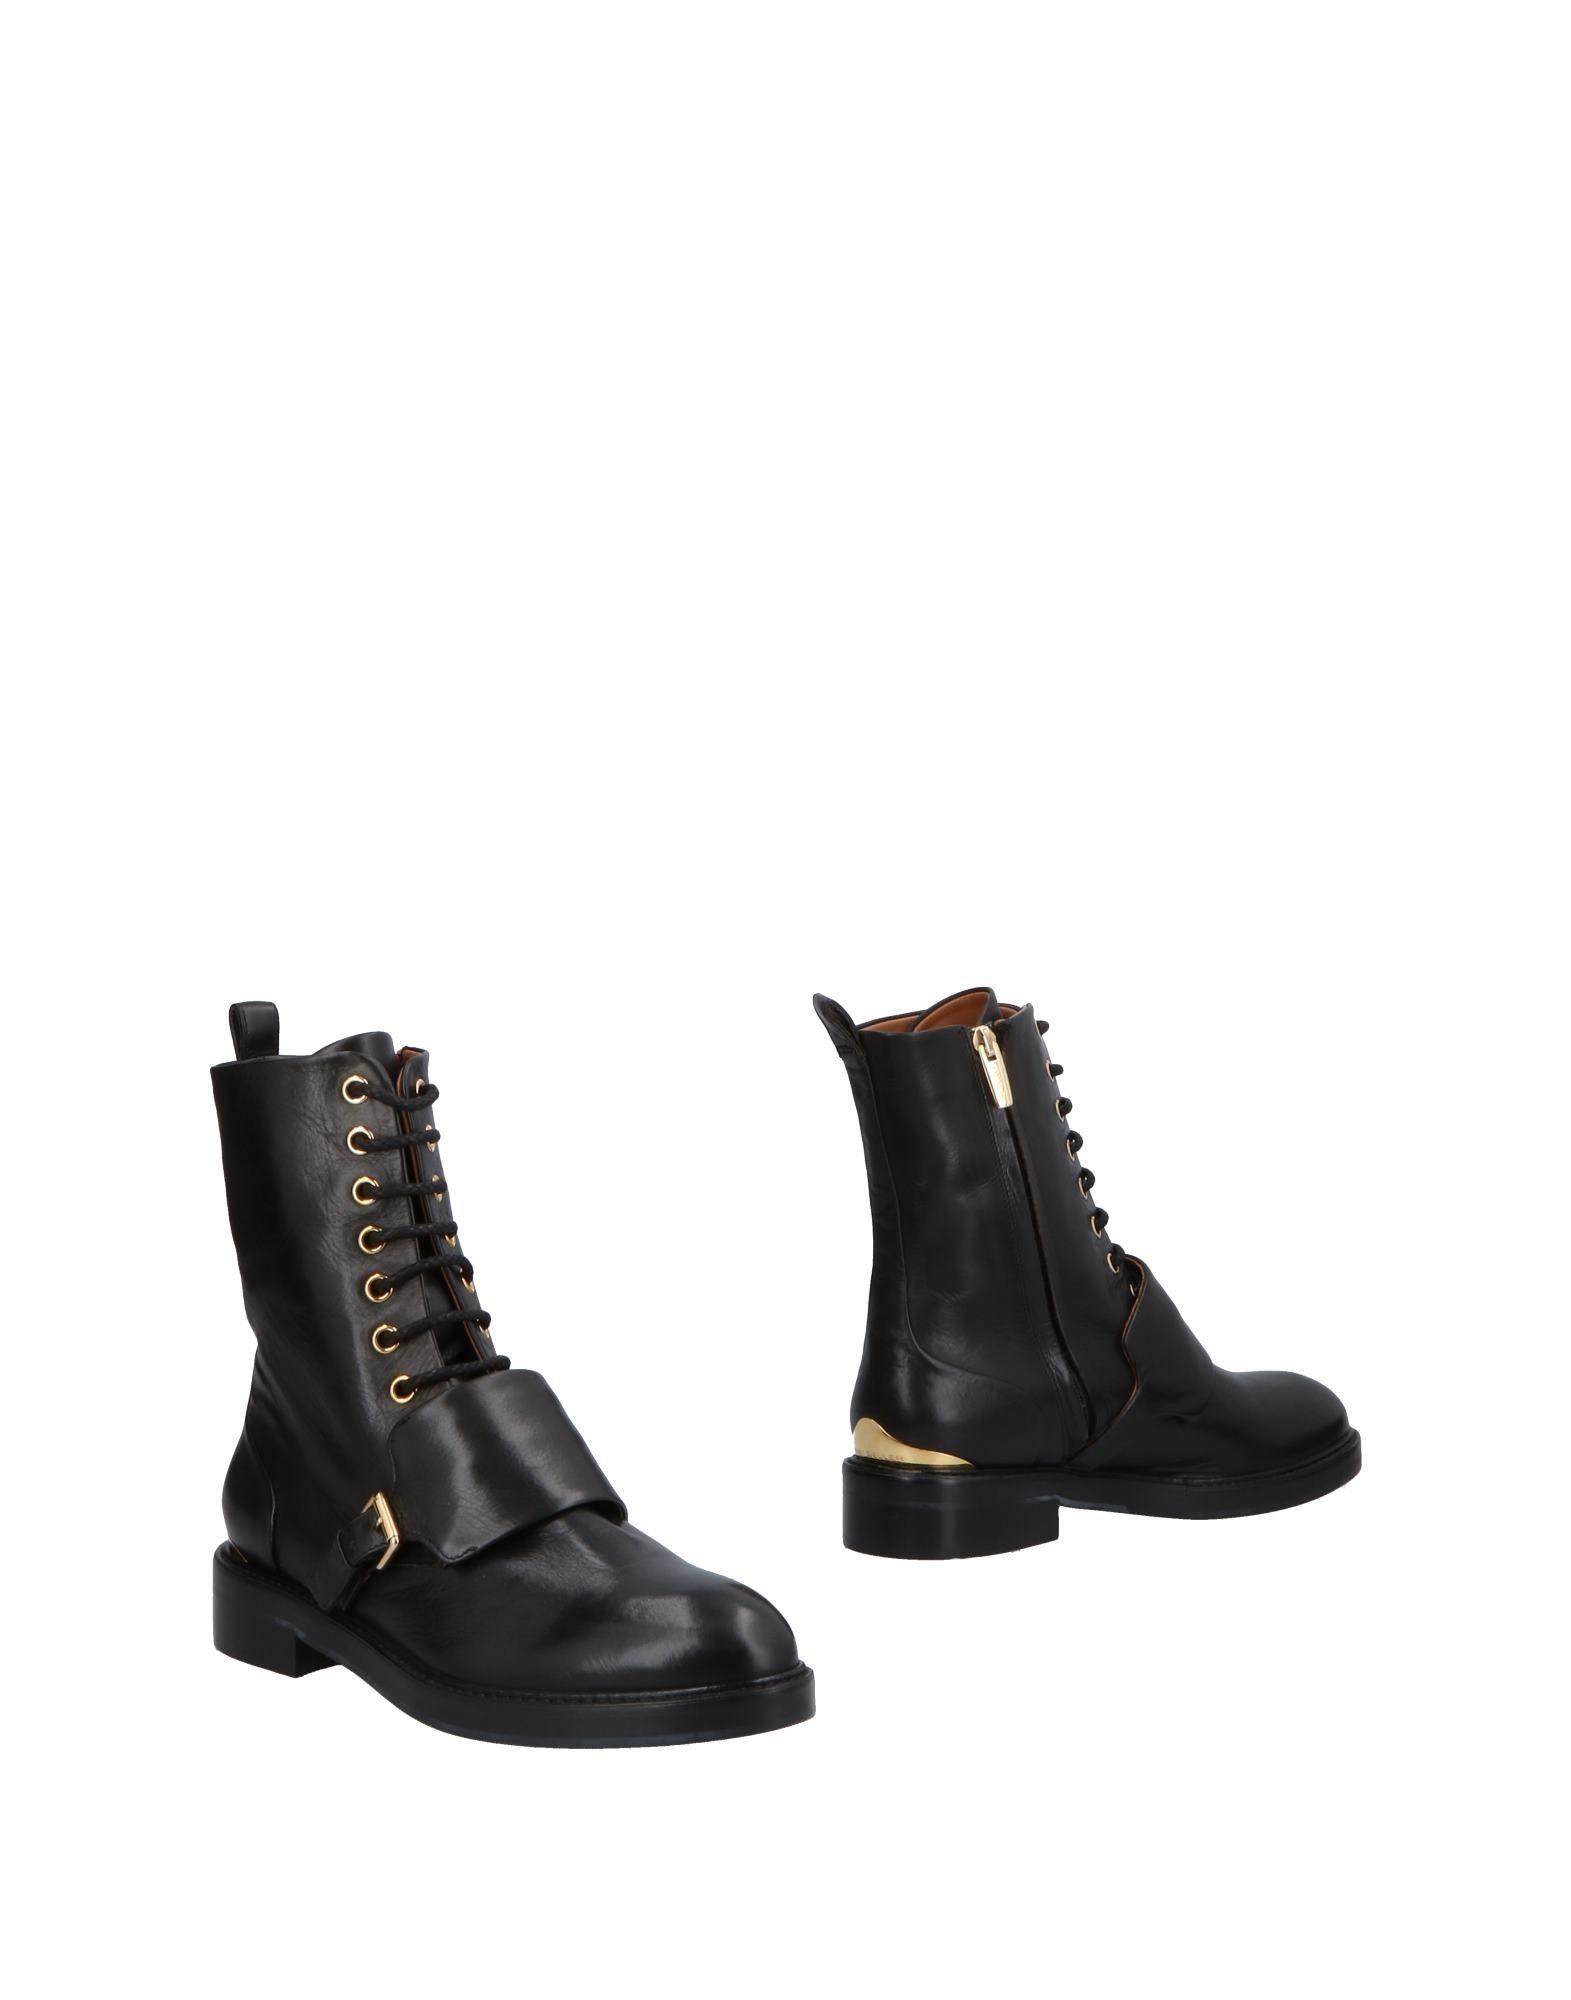 Stilvolle billige Schuhe Damen The Seller Stiefelette Damen Schuhe  11508441VA 44a377